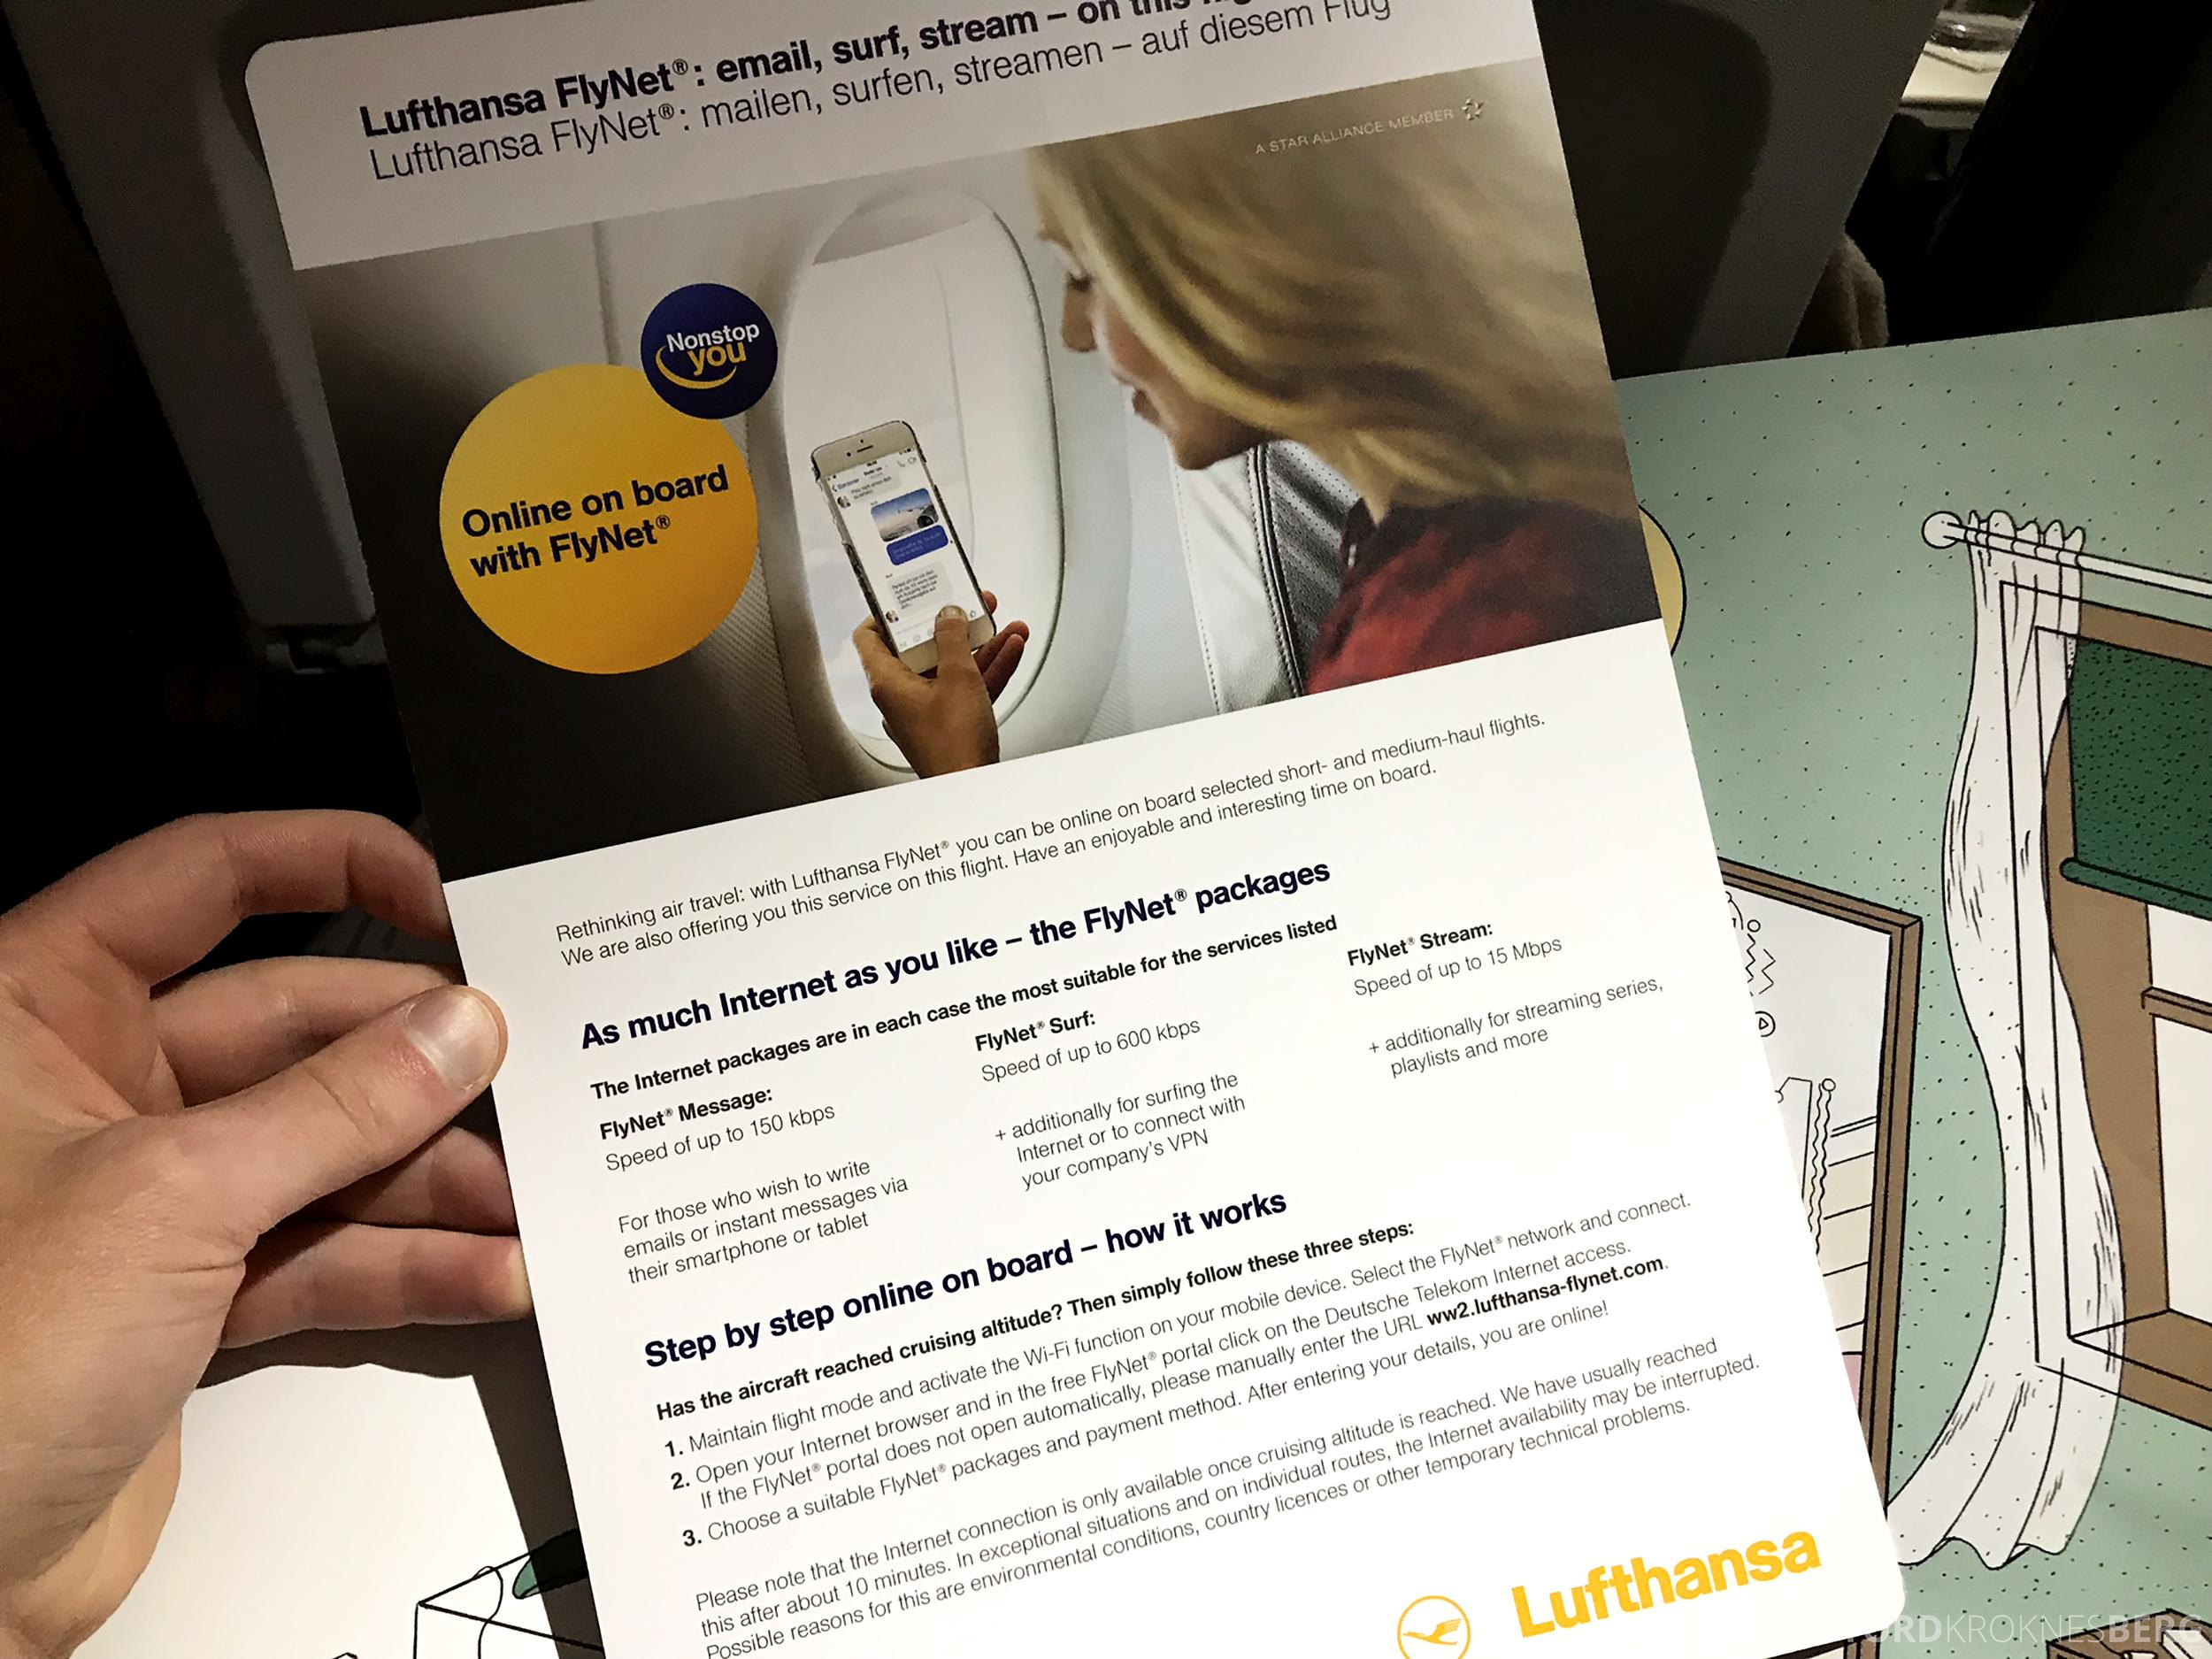 Lufthansa Business Class Oslo Rome Wi-Fi